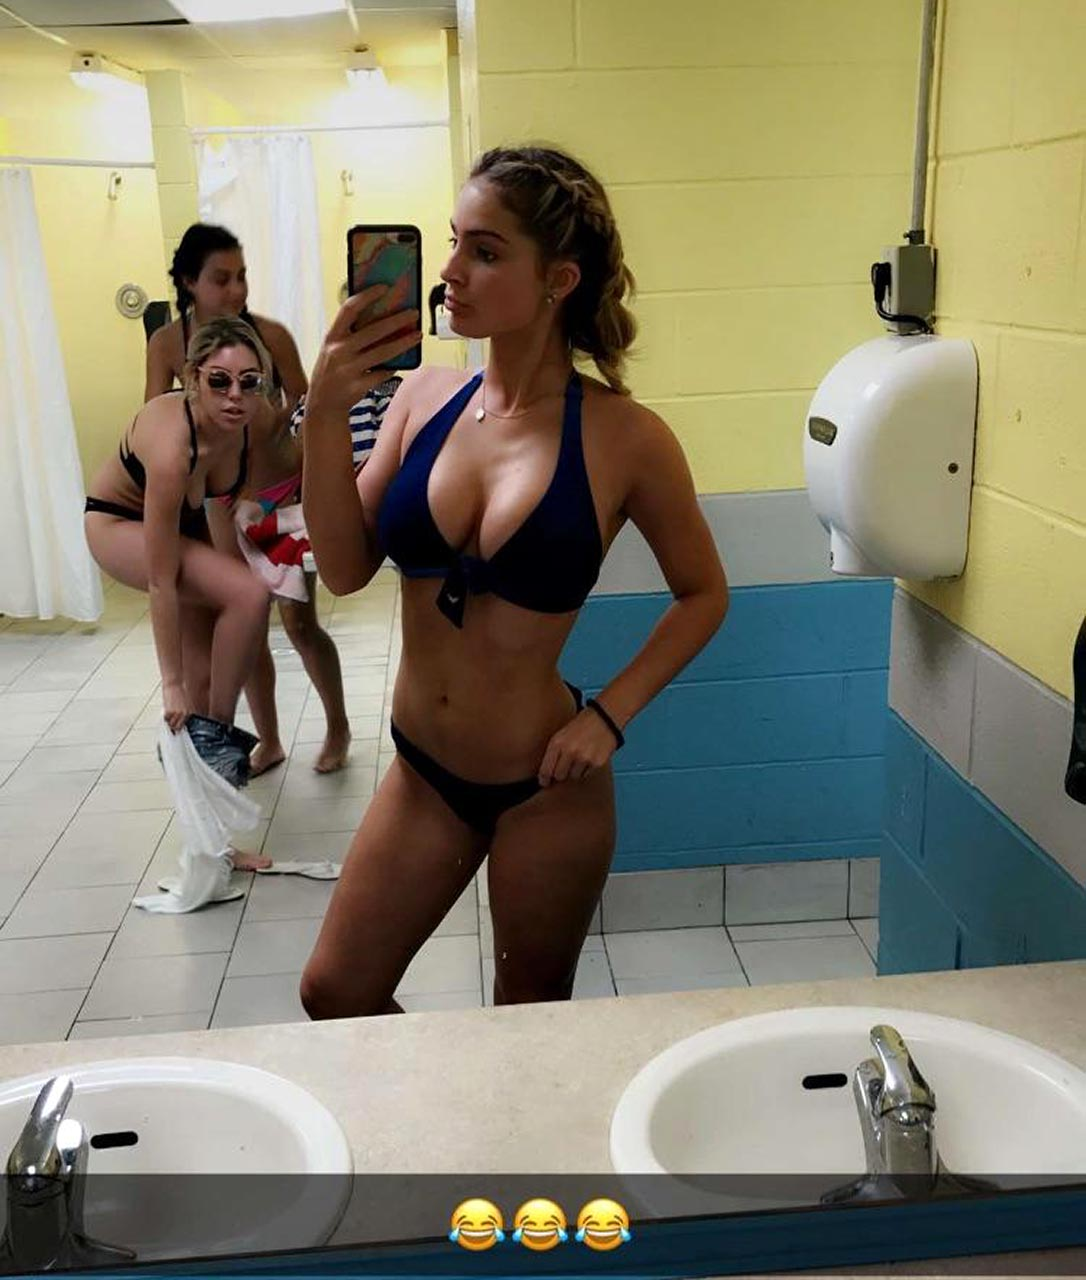 carrington durham nude sexy photos scandal planet